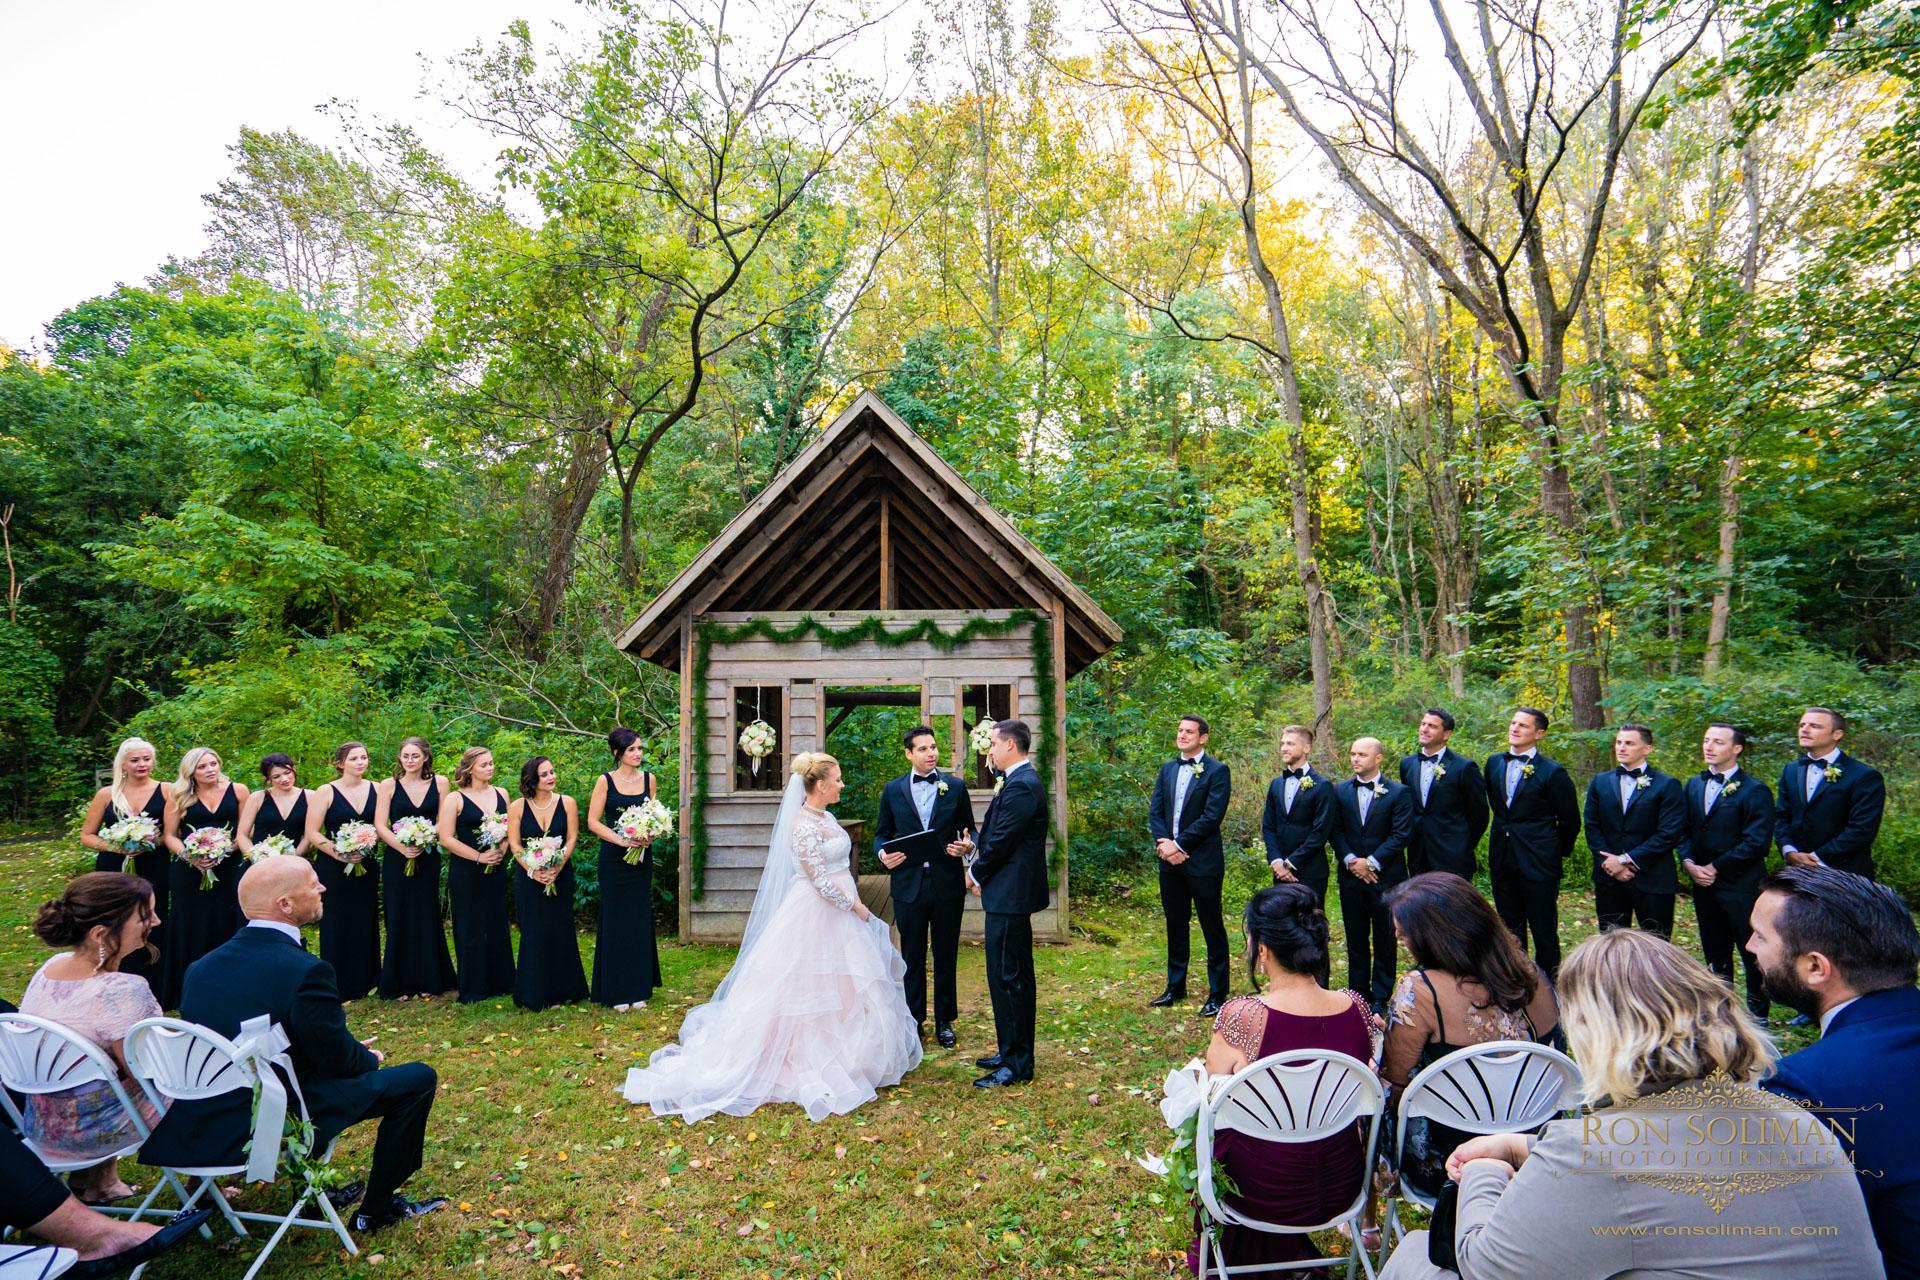 ALVERTHORPE MANOR HOUSE WEDDING 23